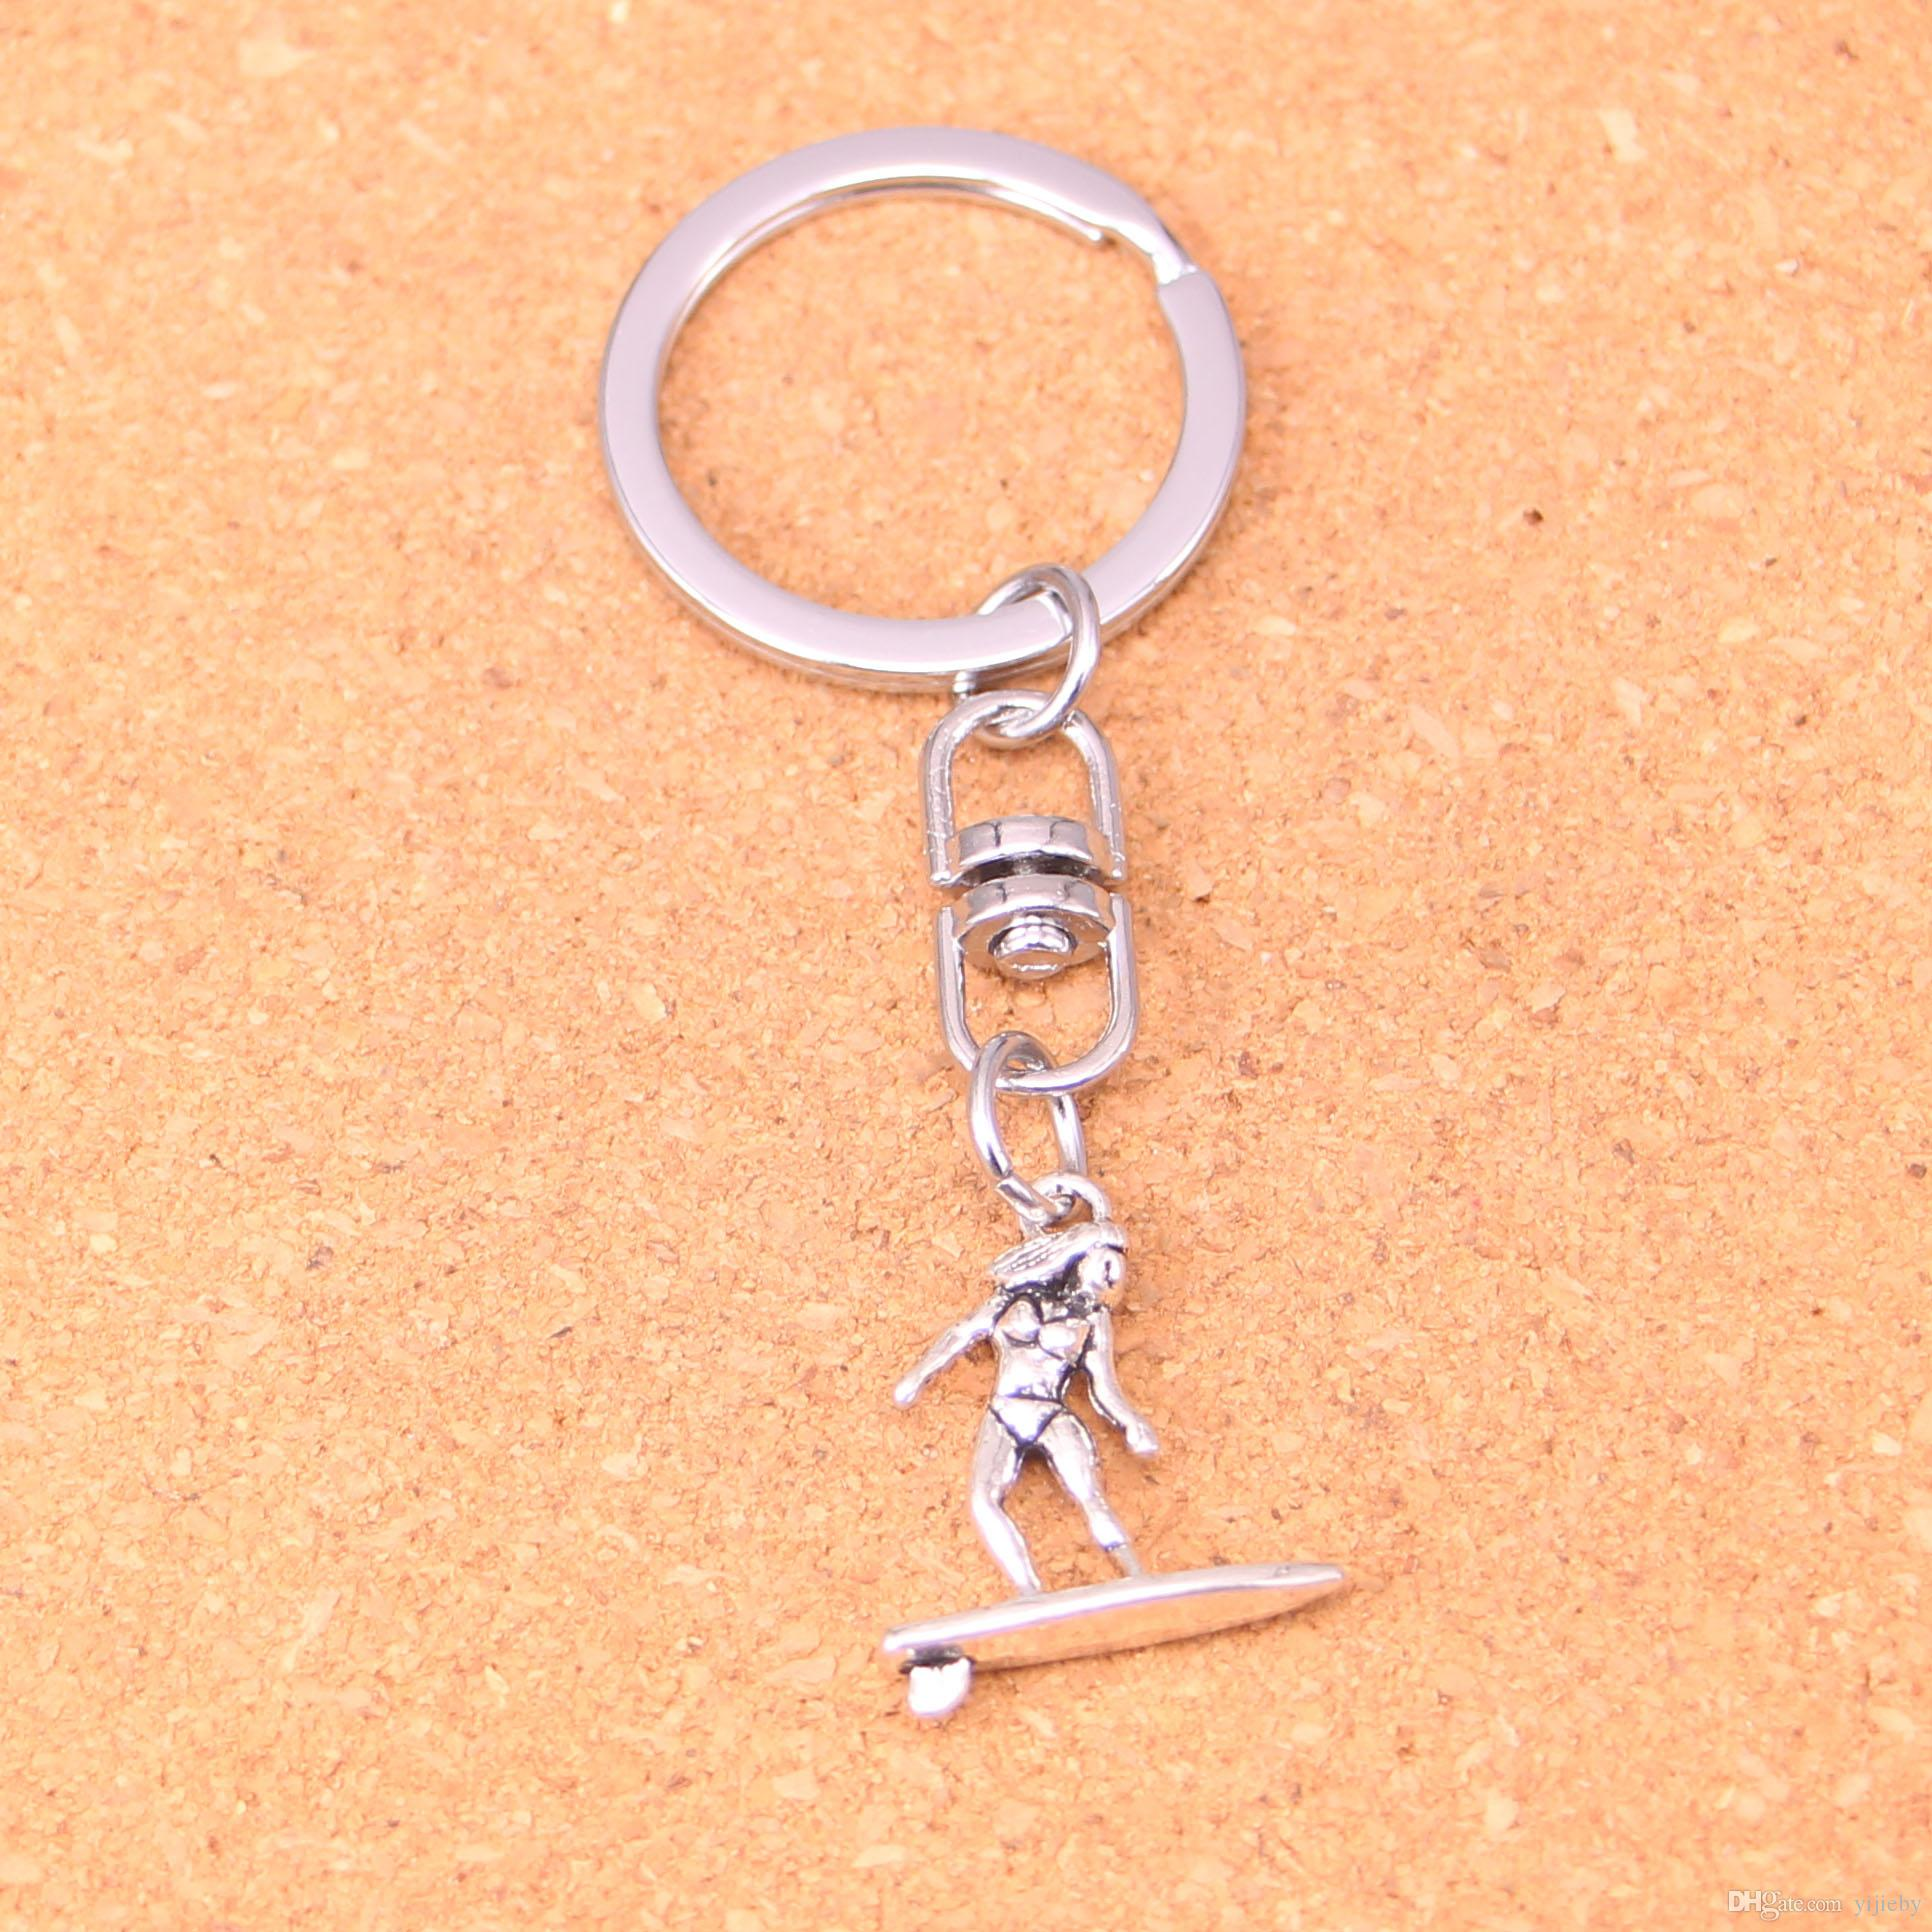 Vintage lady girl Key Rings Fashion Car Keychain Silver Color Metal Key Chains Accessory